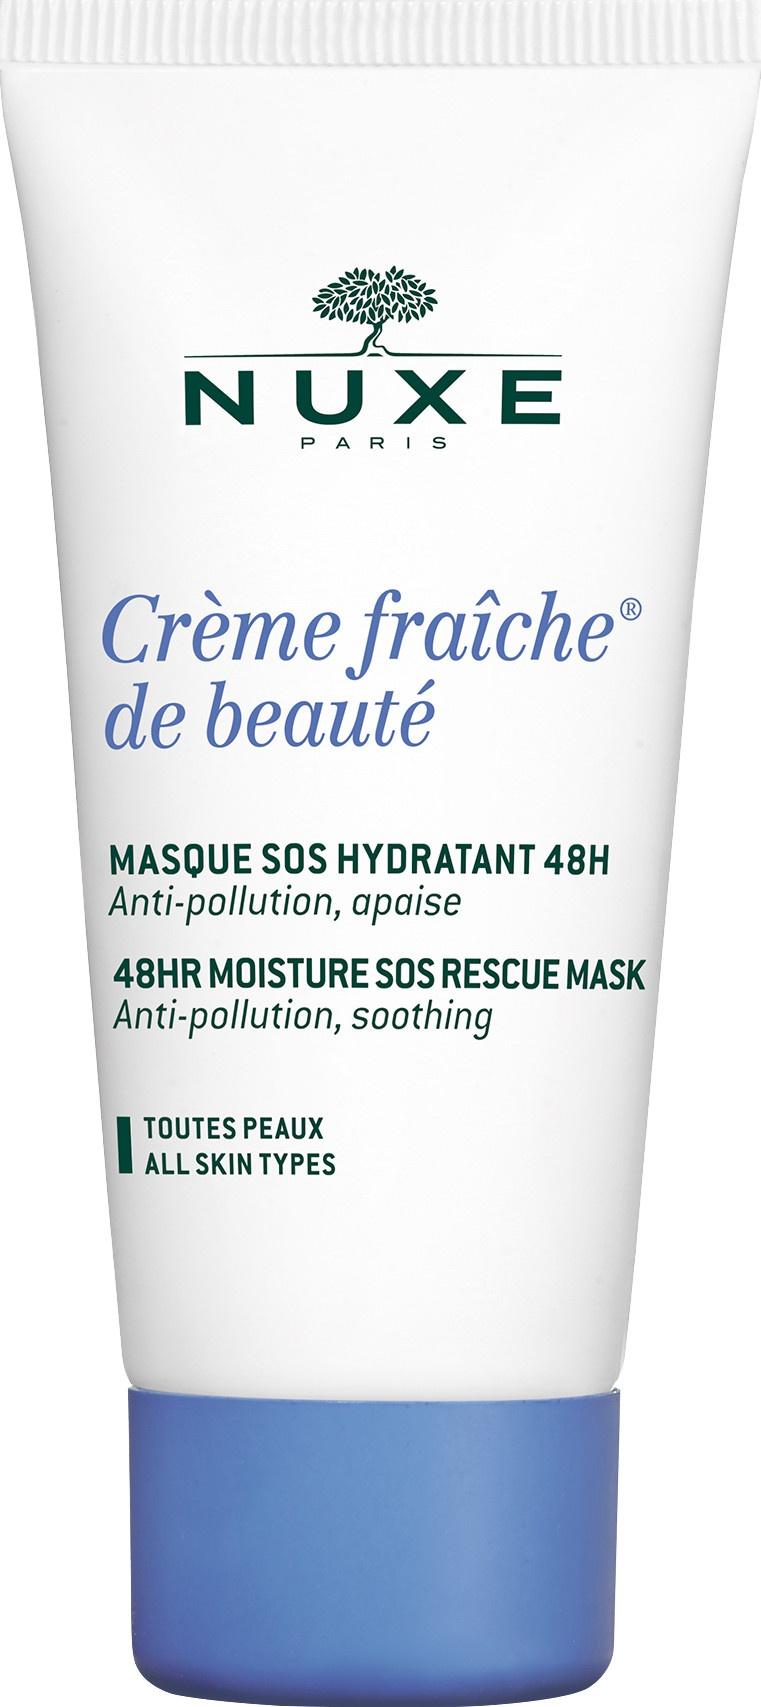 Nuxe 48 Hr Moisture Sos Rescue Mask